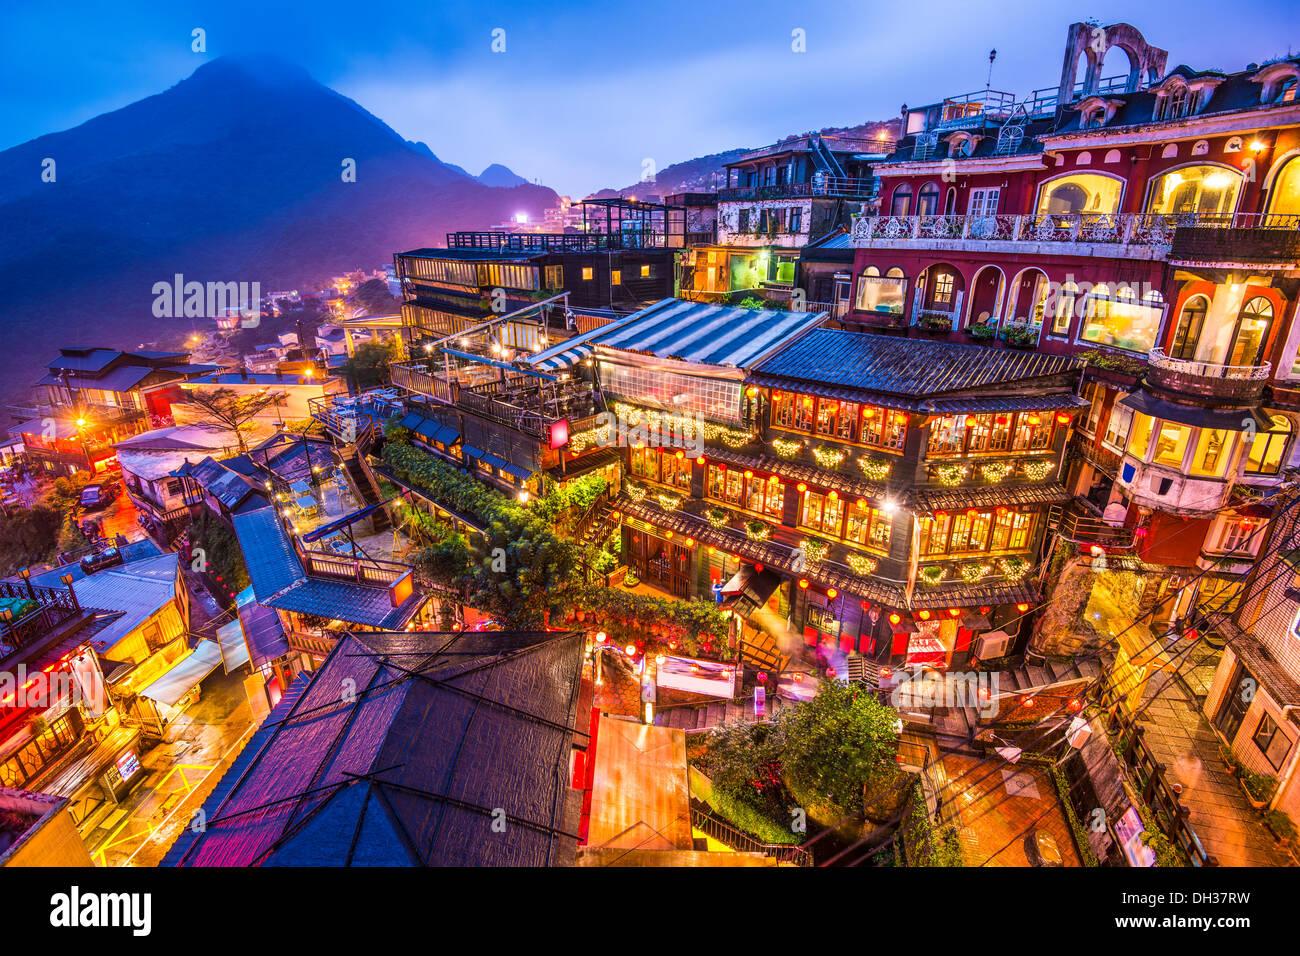 Teahouse collinare in Jiufen, Taiwan. Immagini Stock